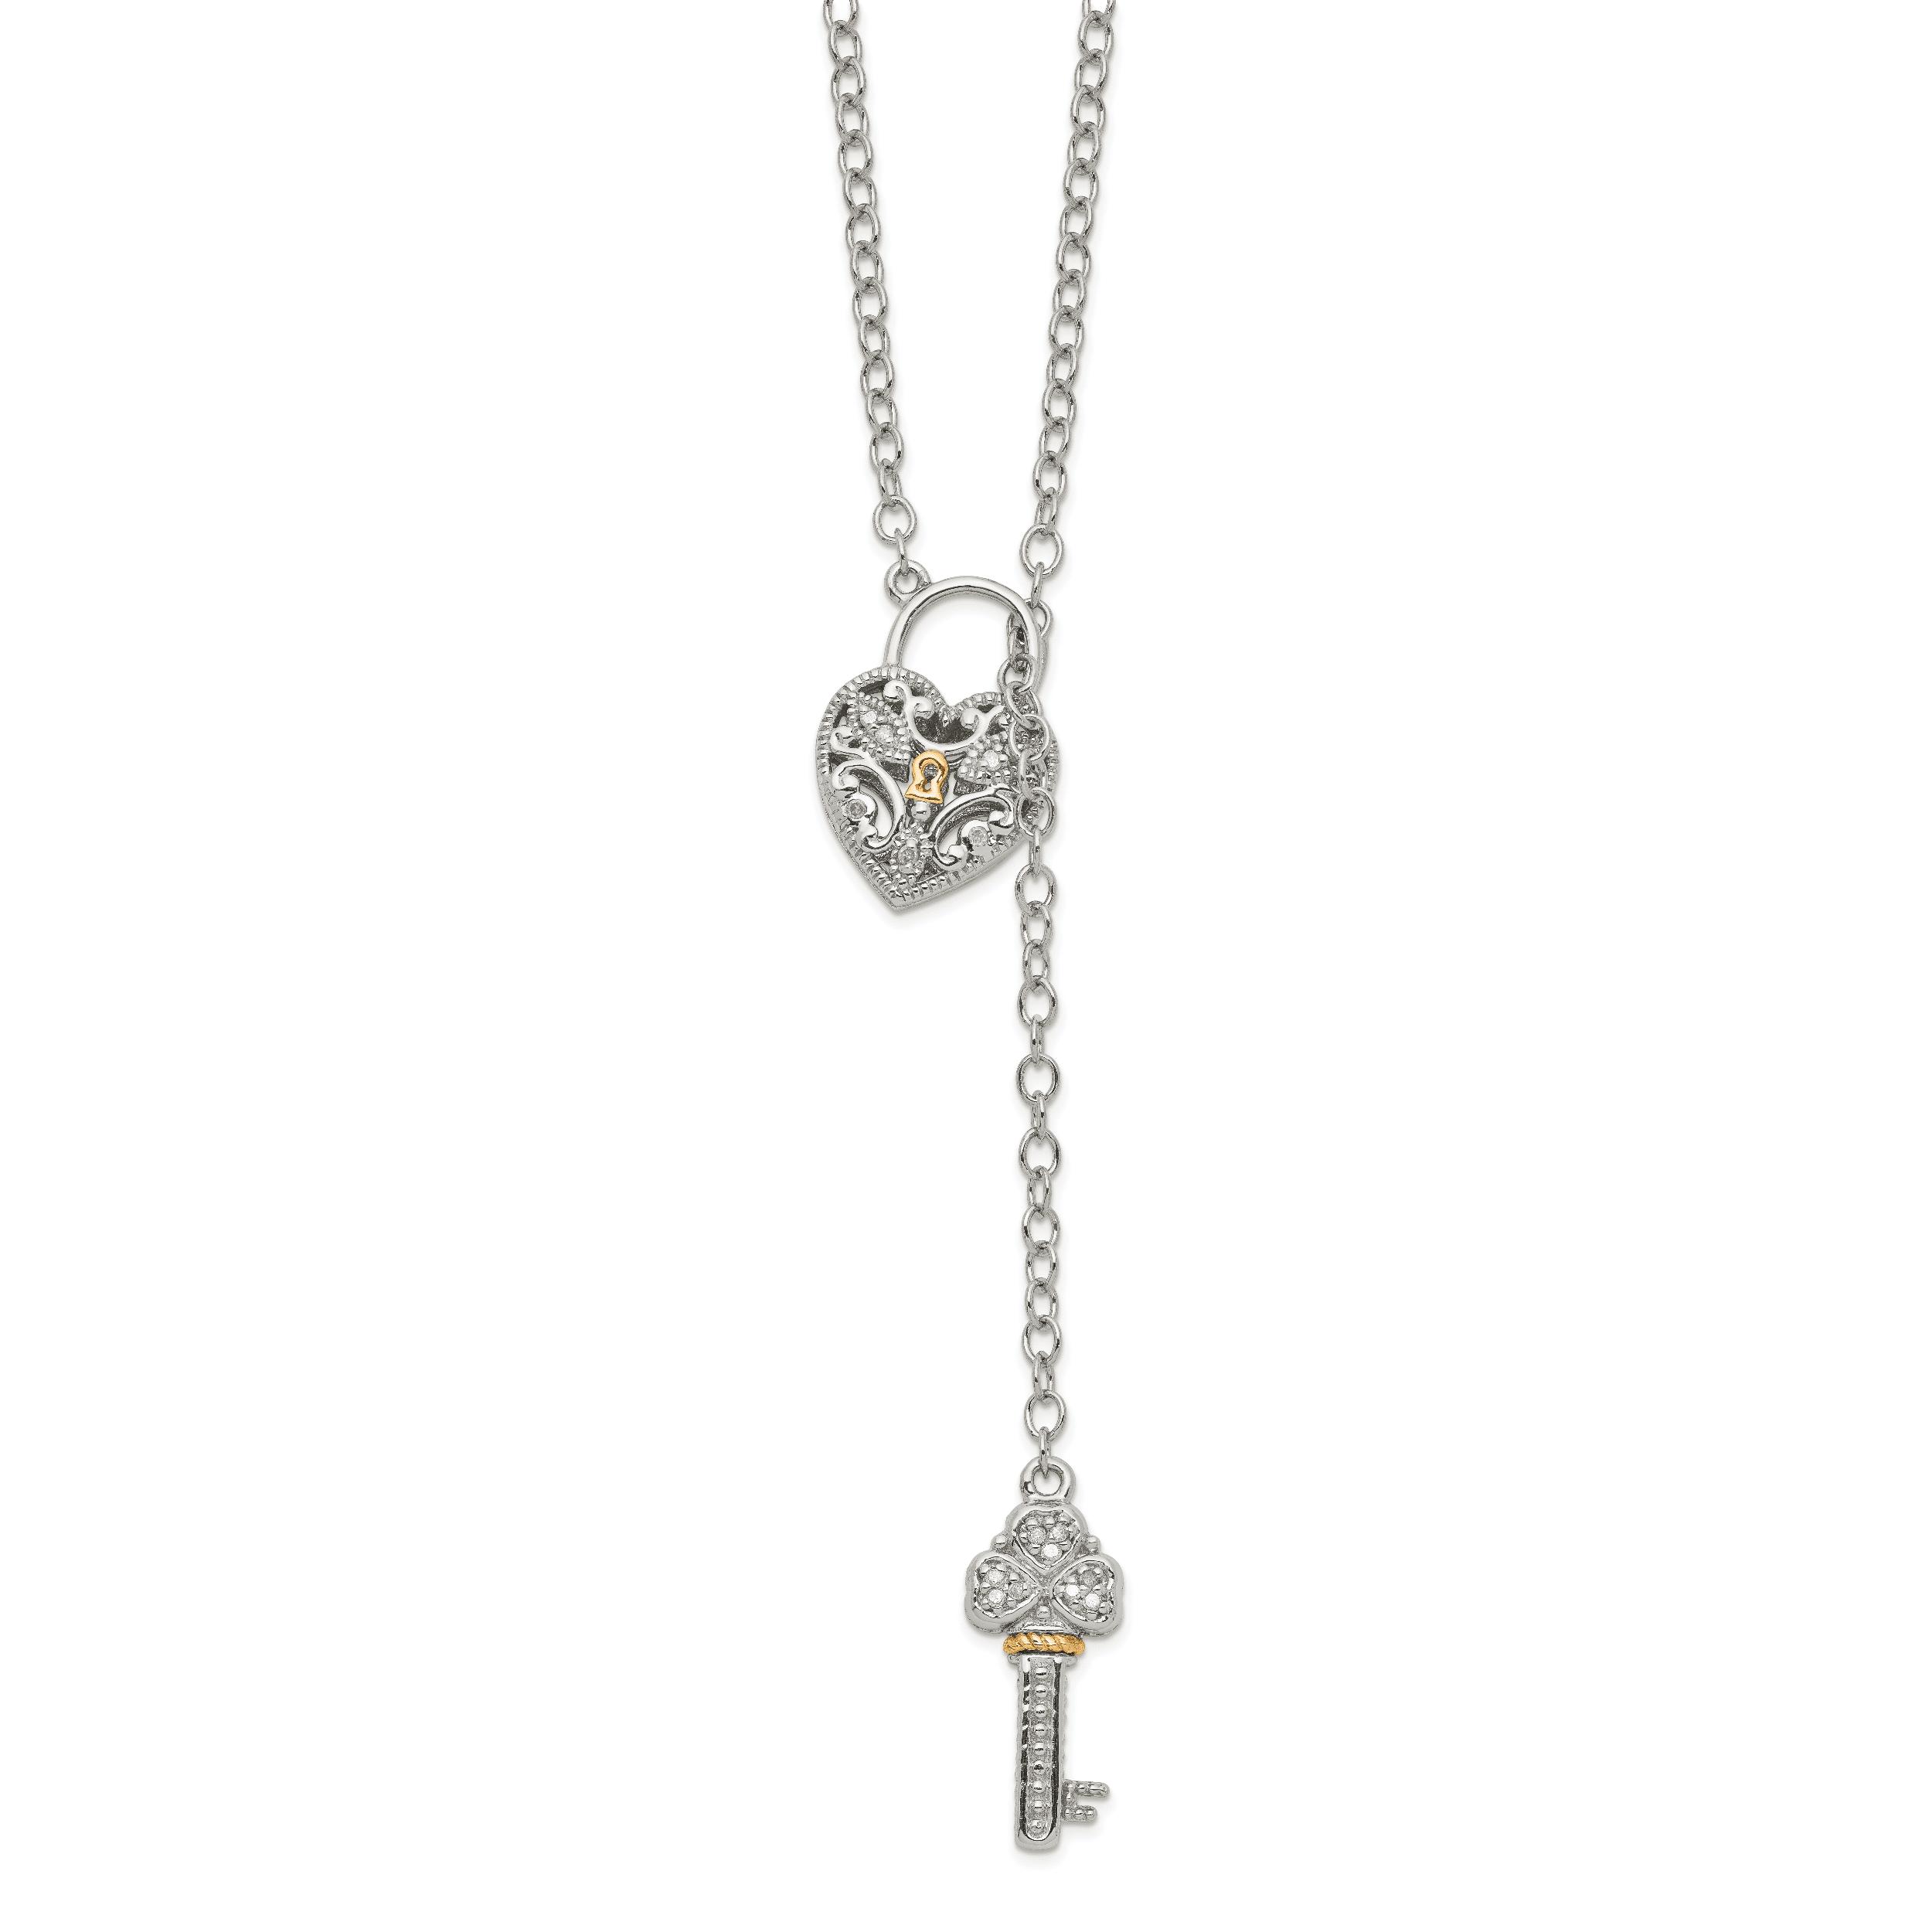 925 Sterling Silver Lock Key Pendant Love Charm Fashion